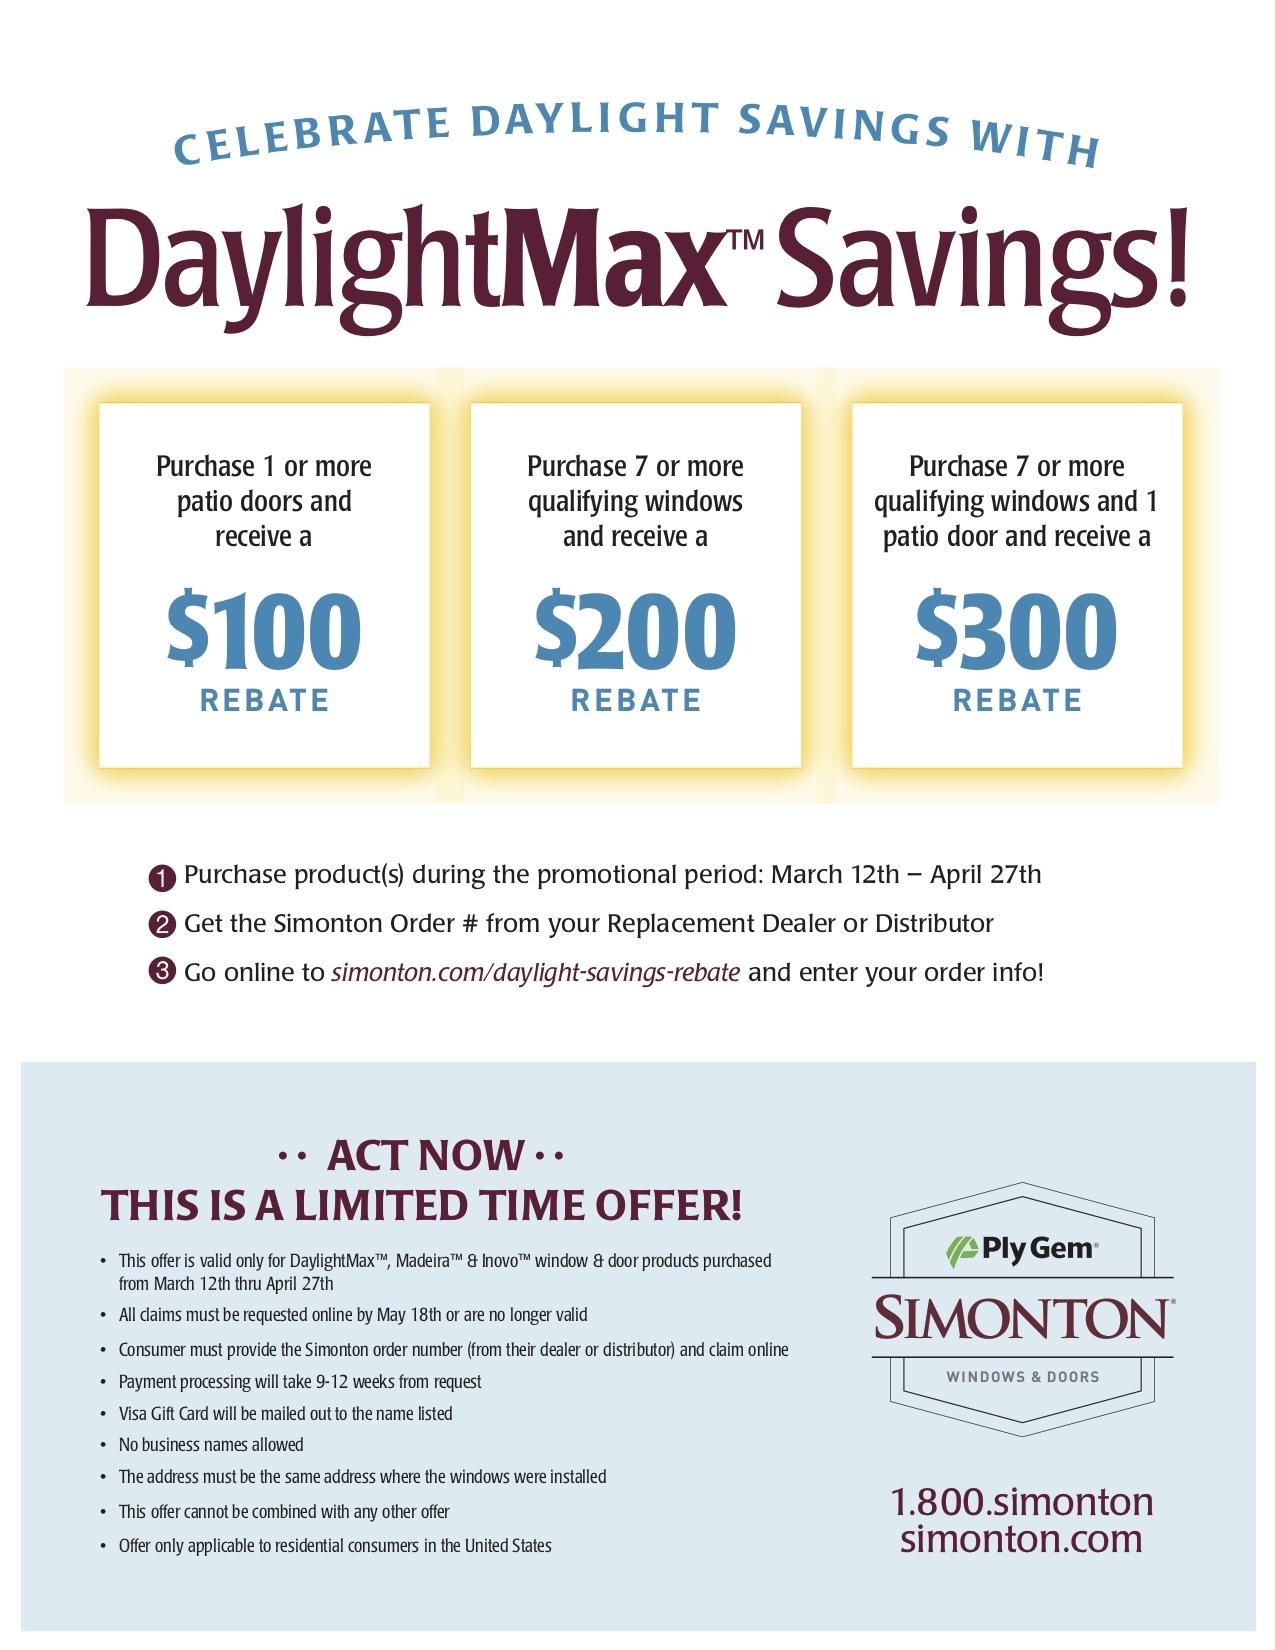 Spring 2018 DaylightMax Savings Flyer2.jpg